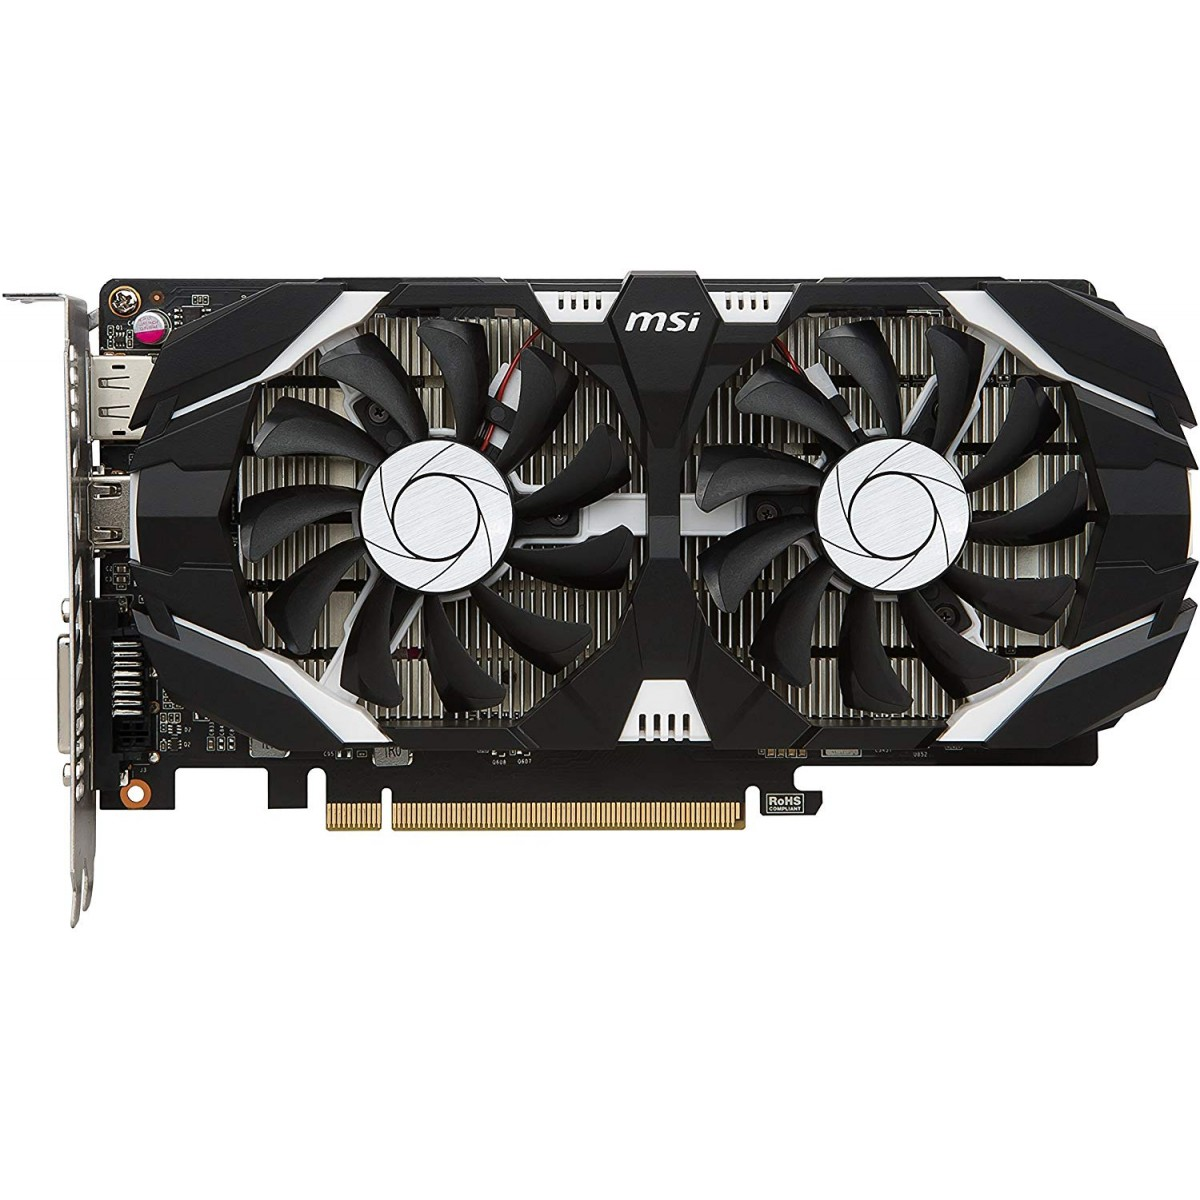 Placa de Vídeo MSI GeForce GTX 1050 Ti 4GT, OC, 4GB, Dual Fan, GDDR5, 912-V809-2272